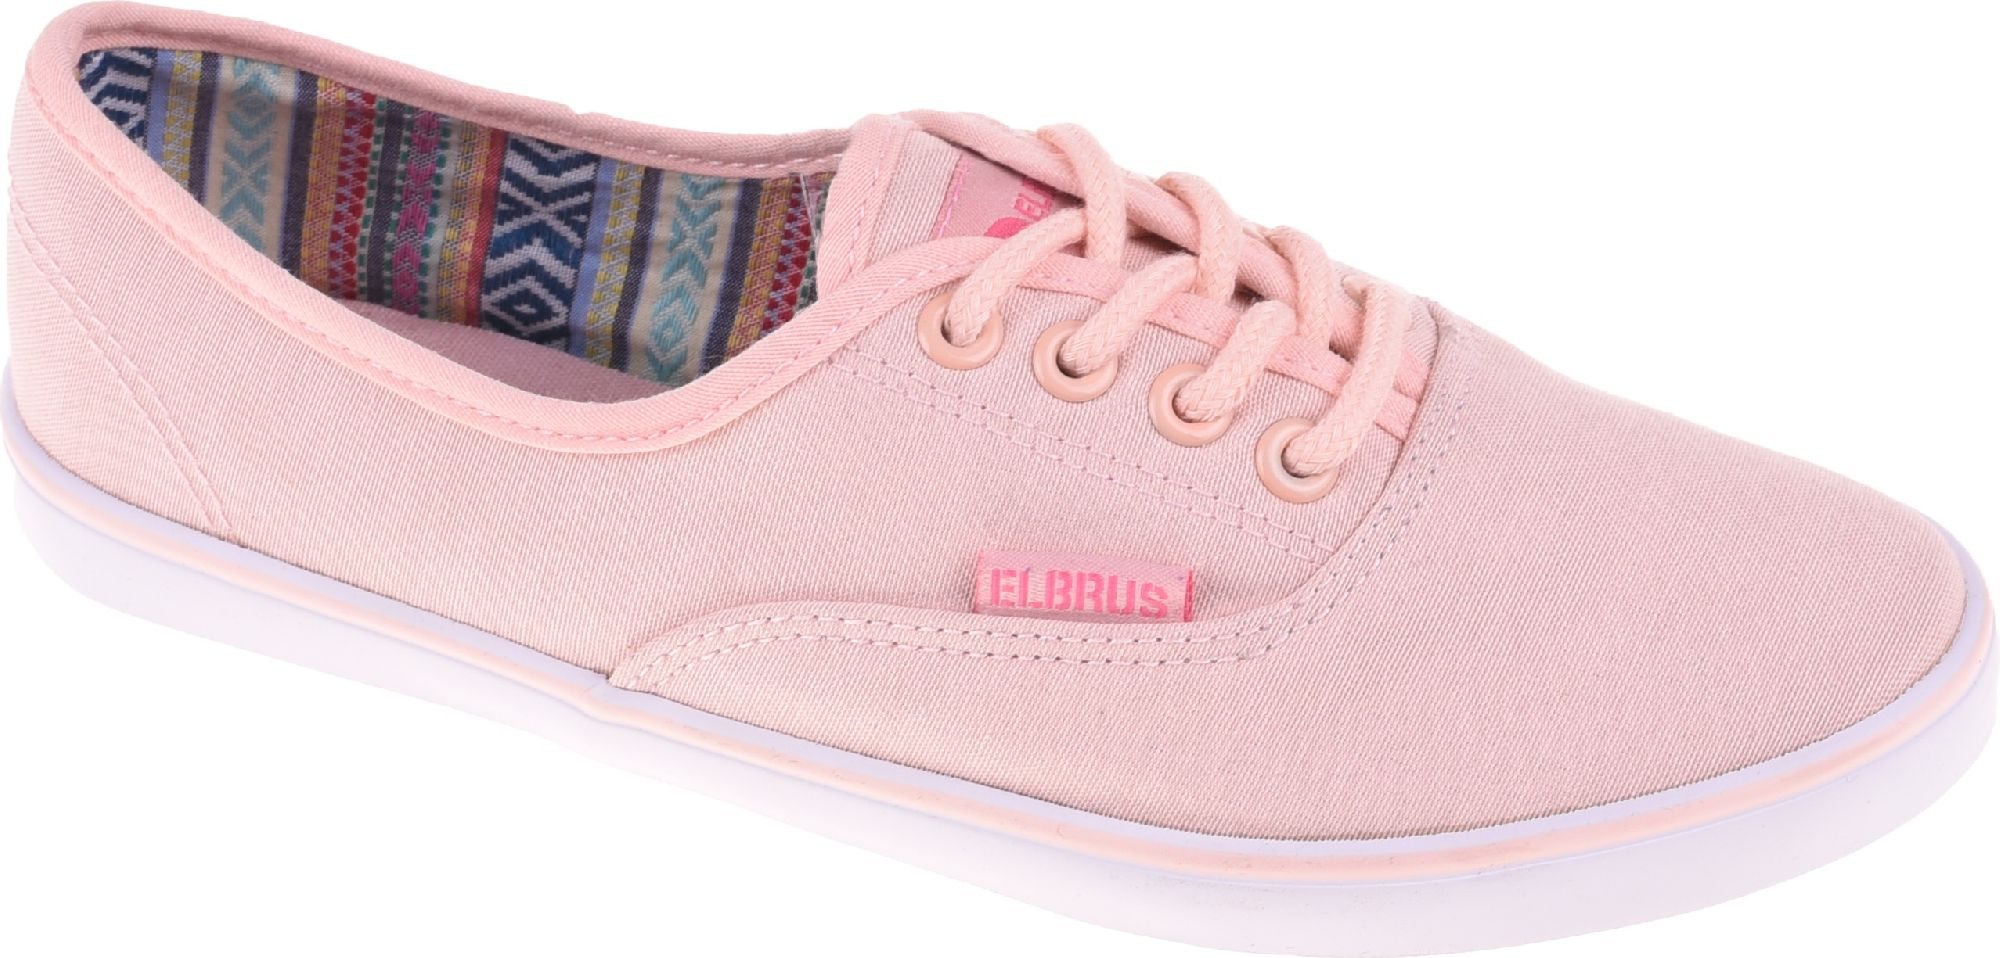 Elbrus Buty Damskie Marlene Wo's Old Pink r. 36 5901979148678